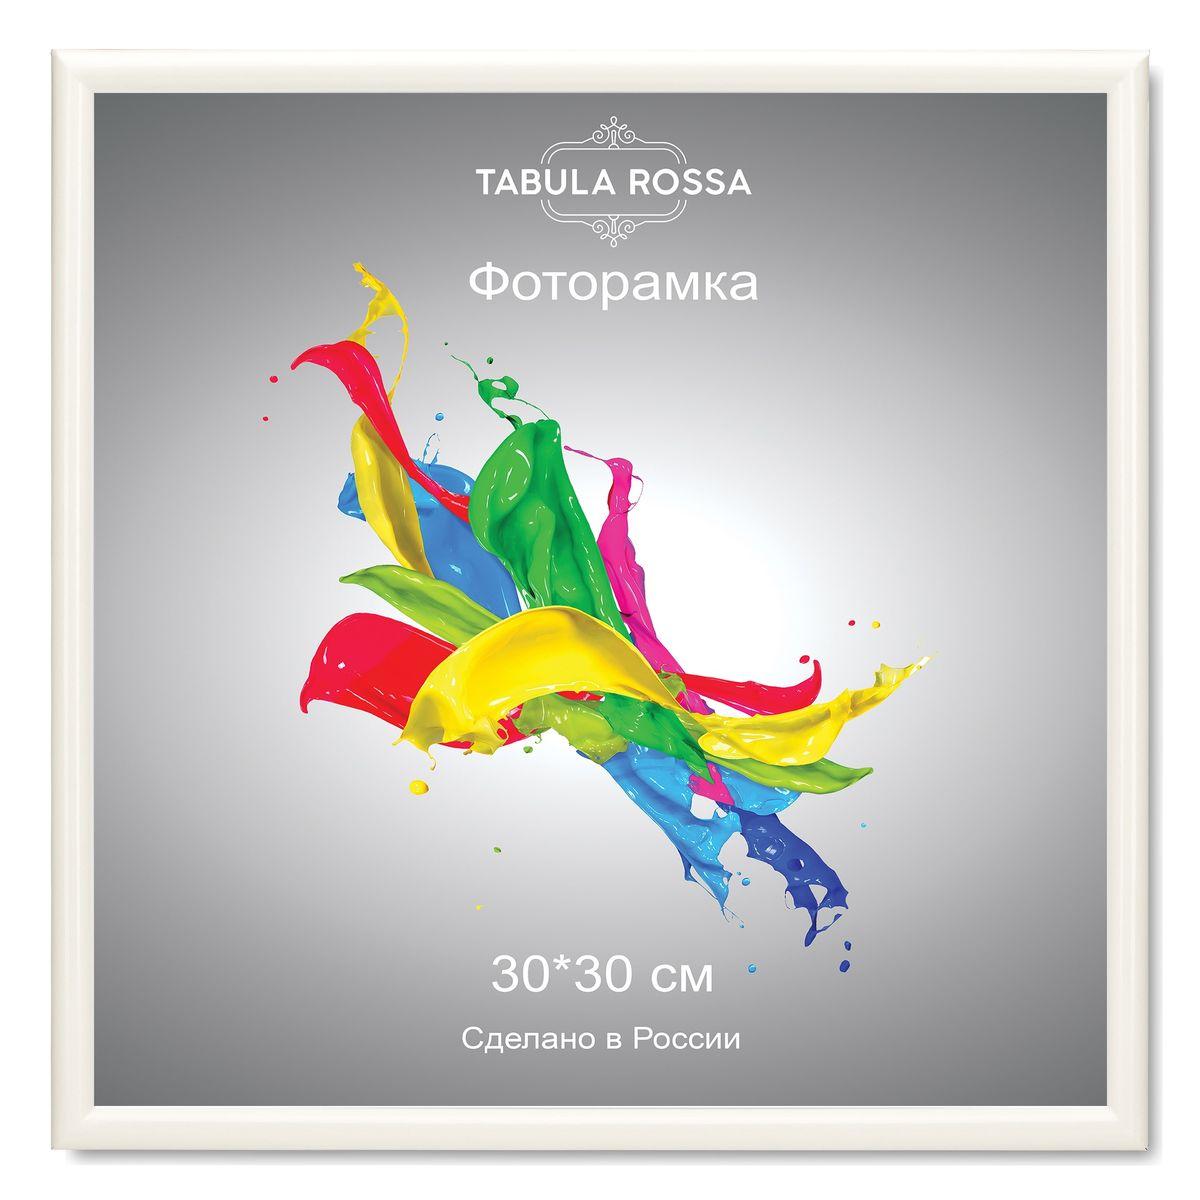 "Фоторамка ""Tabula Rossa"", цвет: белый глянец, 30 х 30 см. ТР 5135"